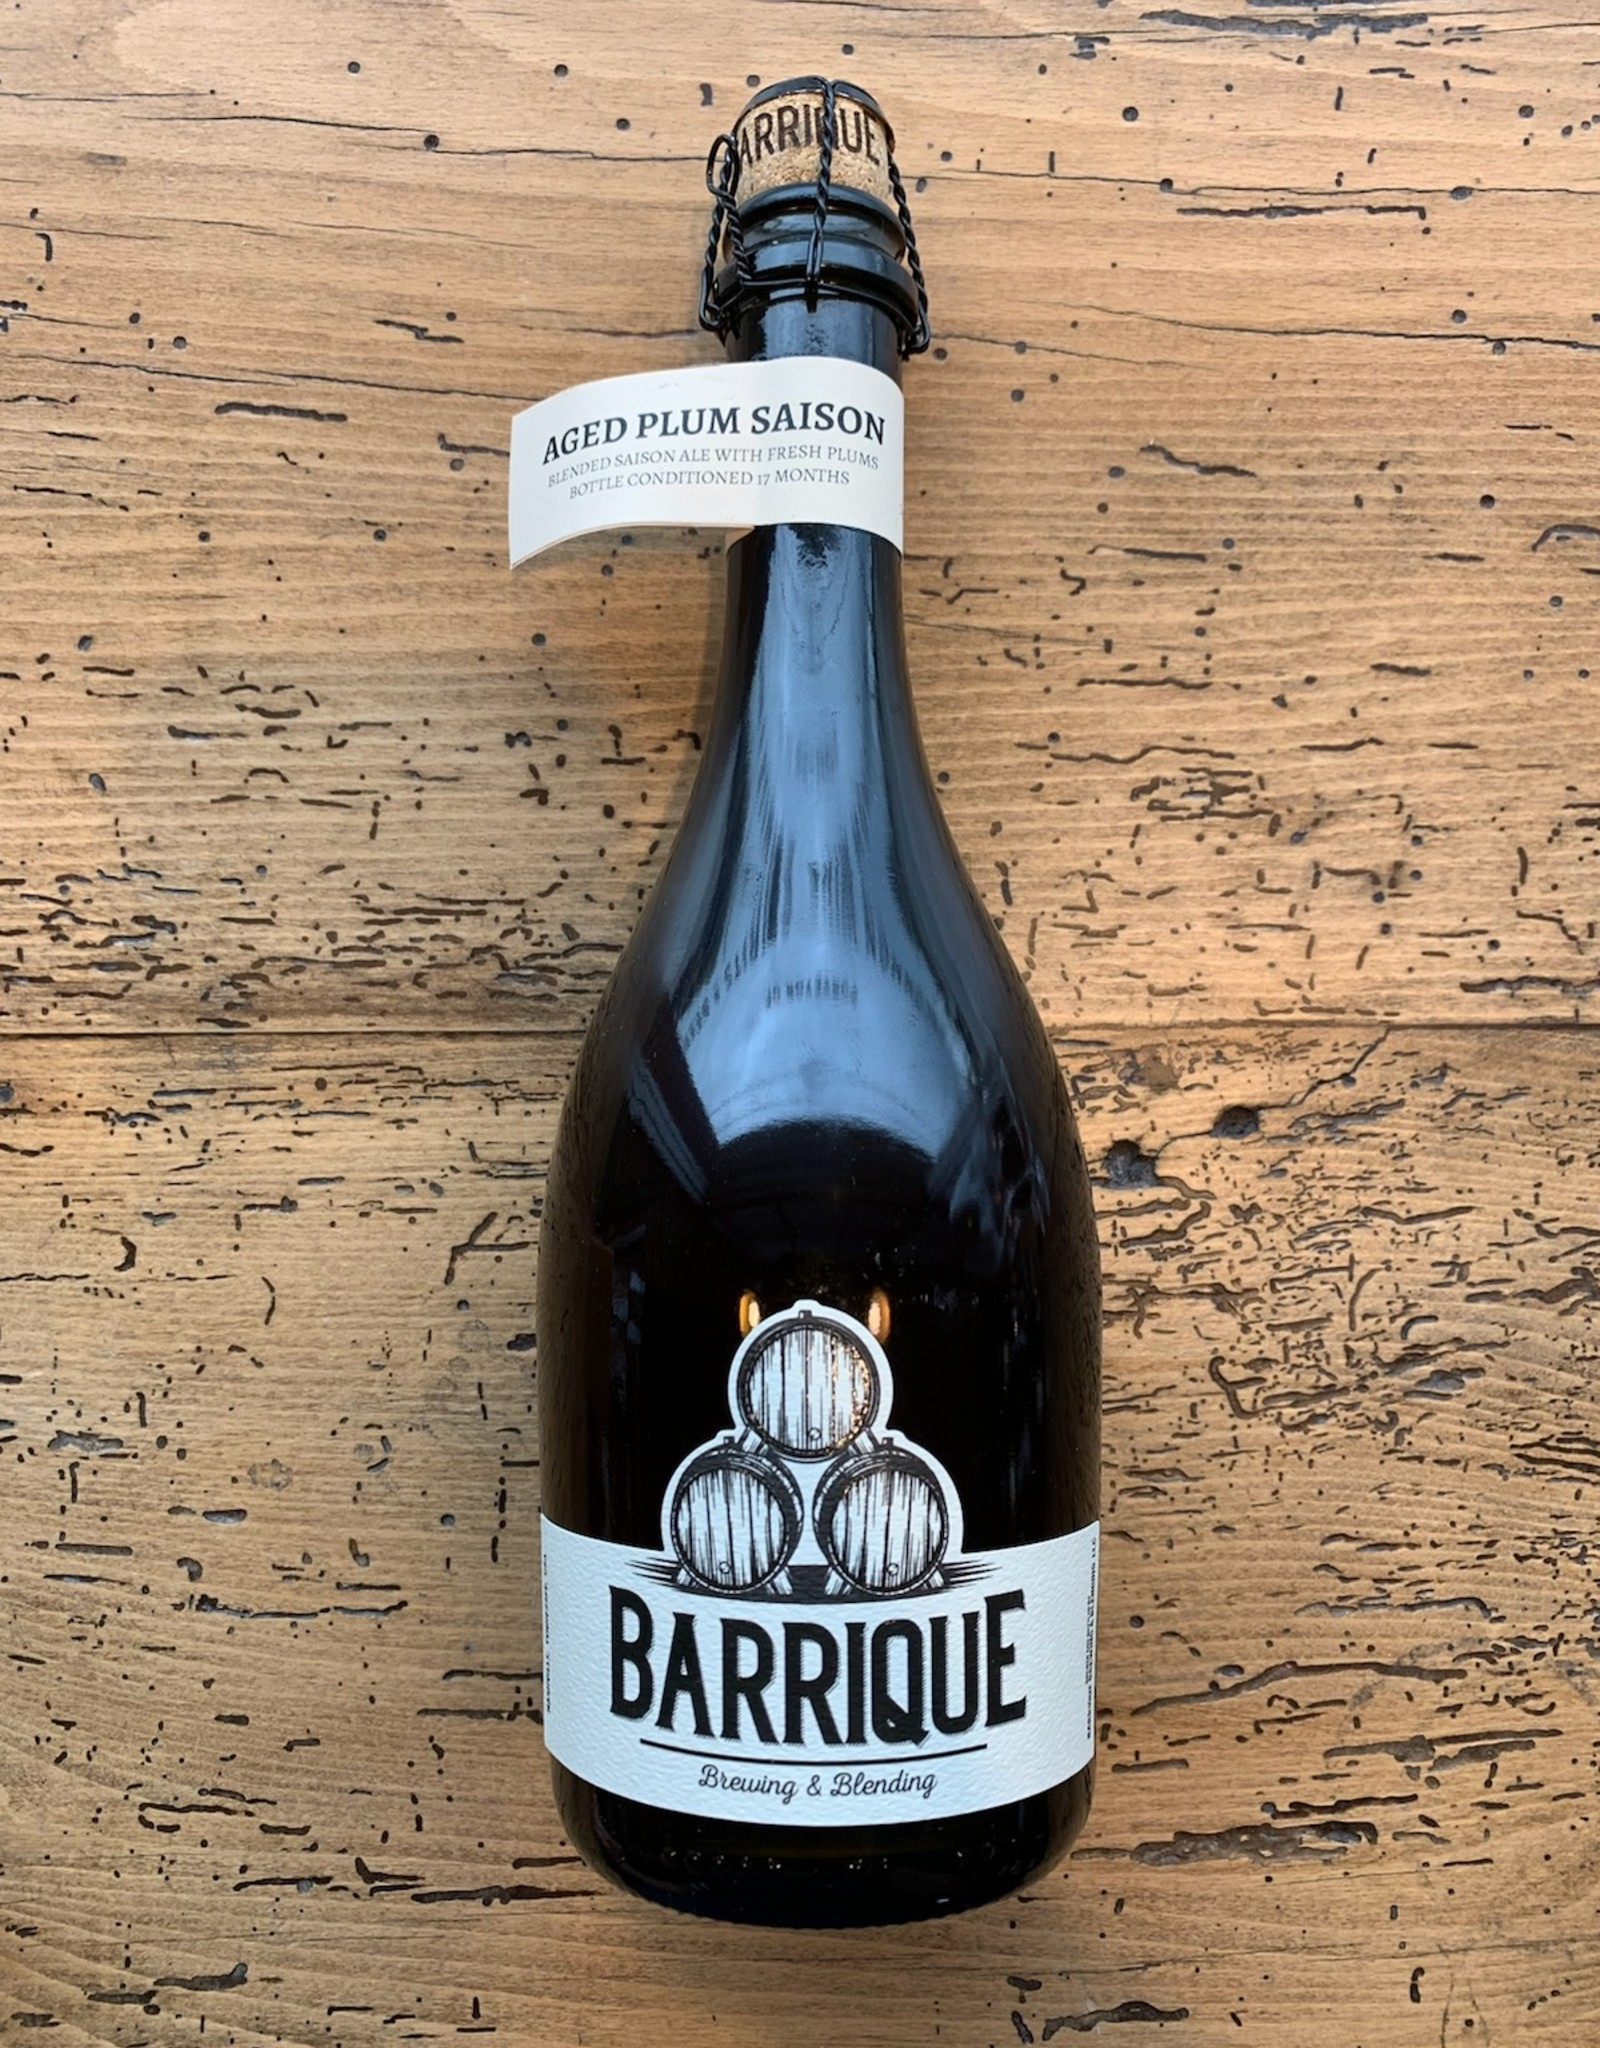 Barrique Brewing & Blending Aged Plum Saison 500ml